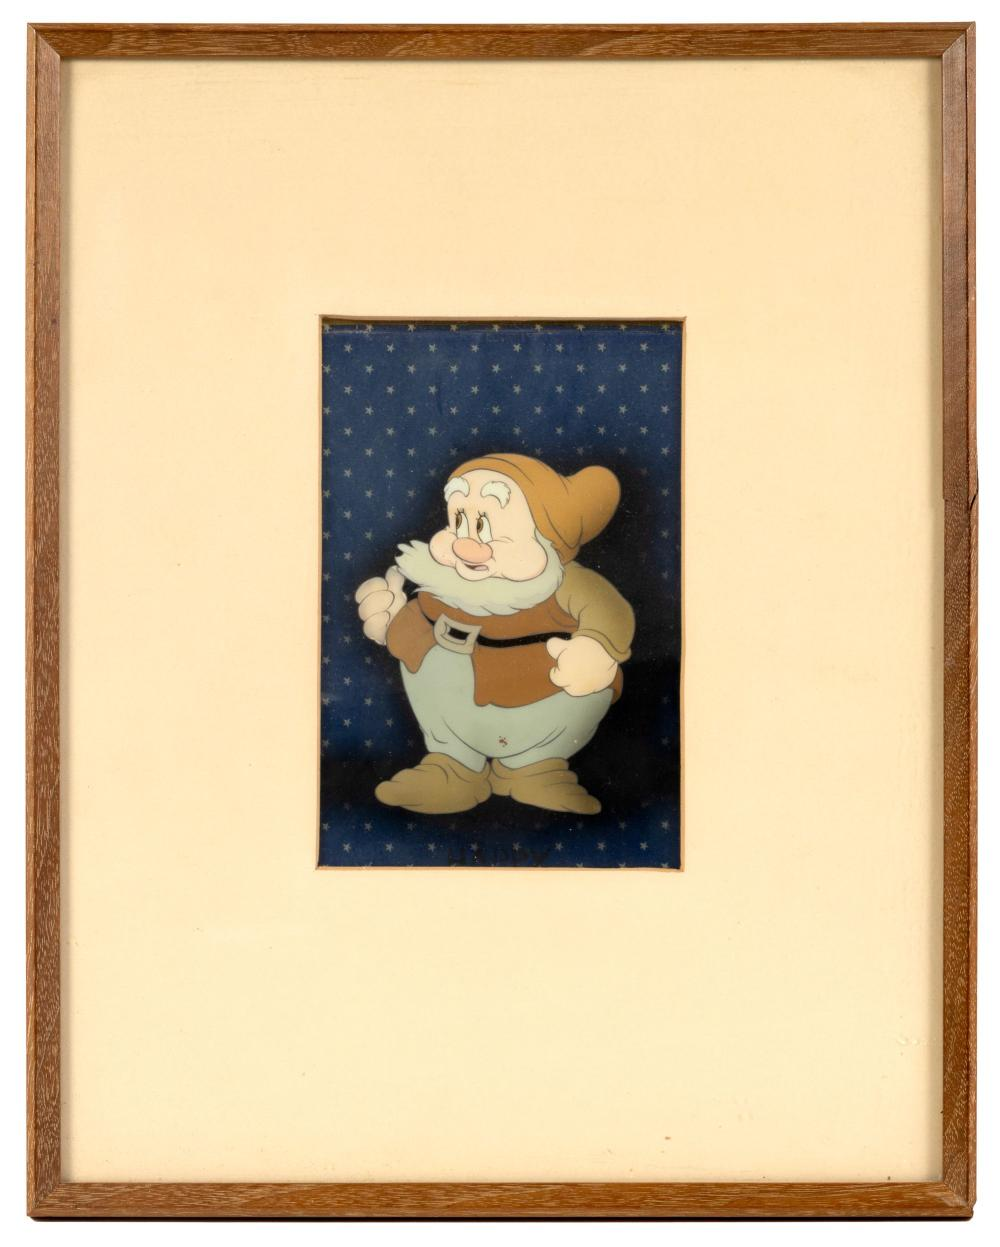 Disney Cel, SNOW WHITE * Happy the Dwarf * Courvoisier * 1937